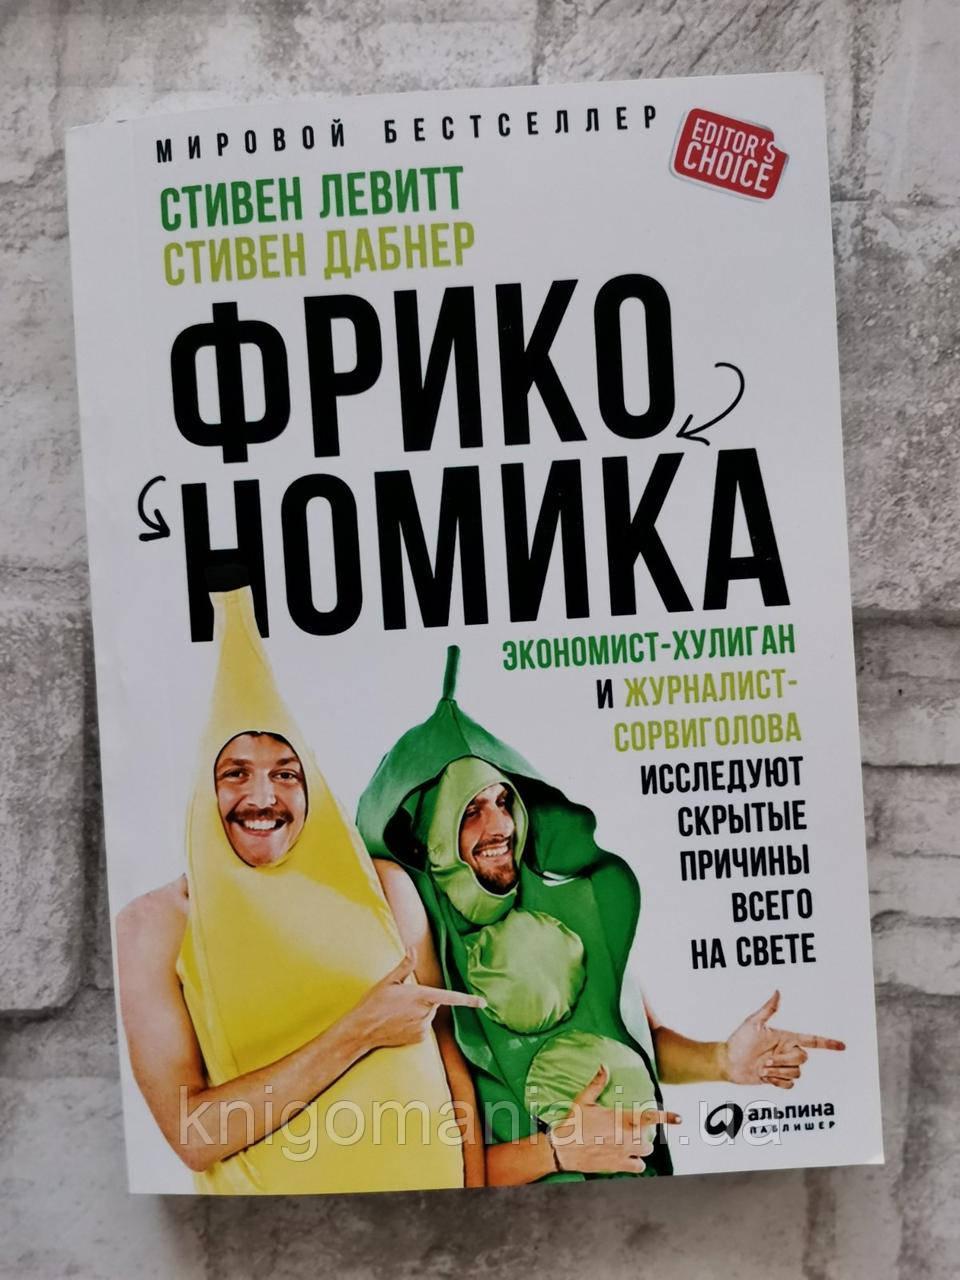 """Фрикономика: Экономист-хулиган и журналист-сорвиголова исследуют причины всего на свете"" Левитт и Дабнер"